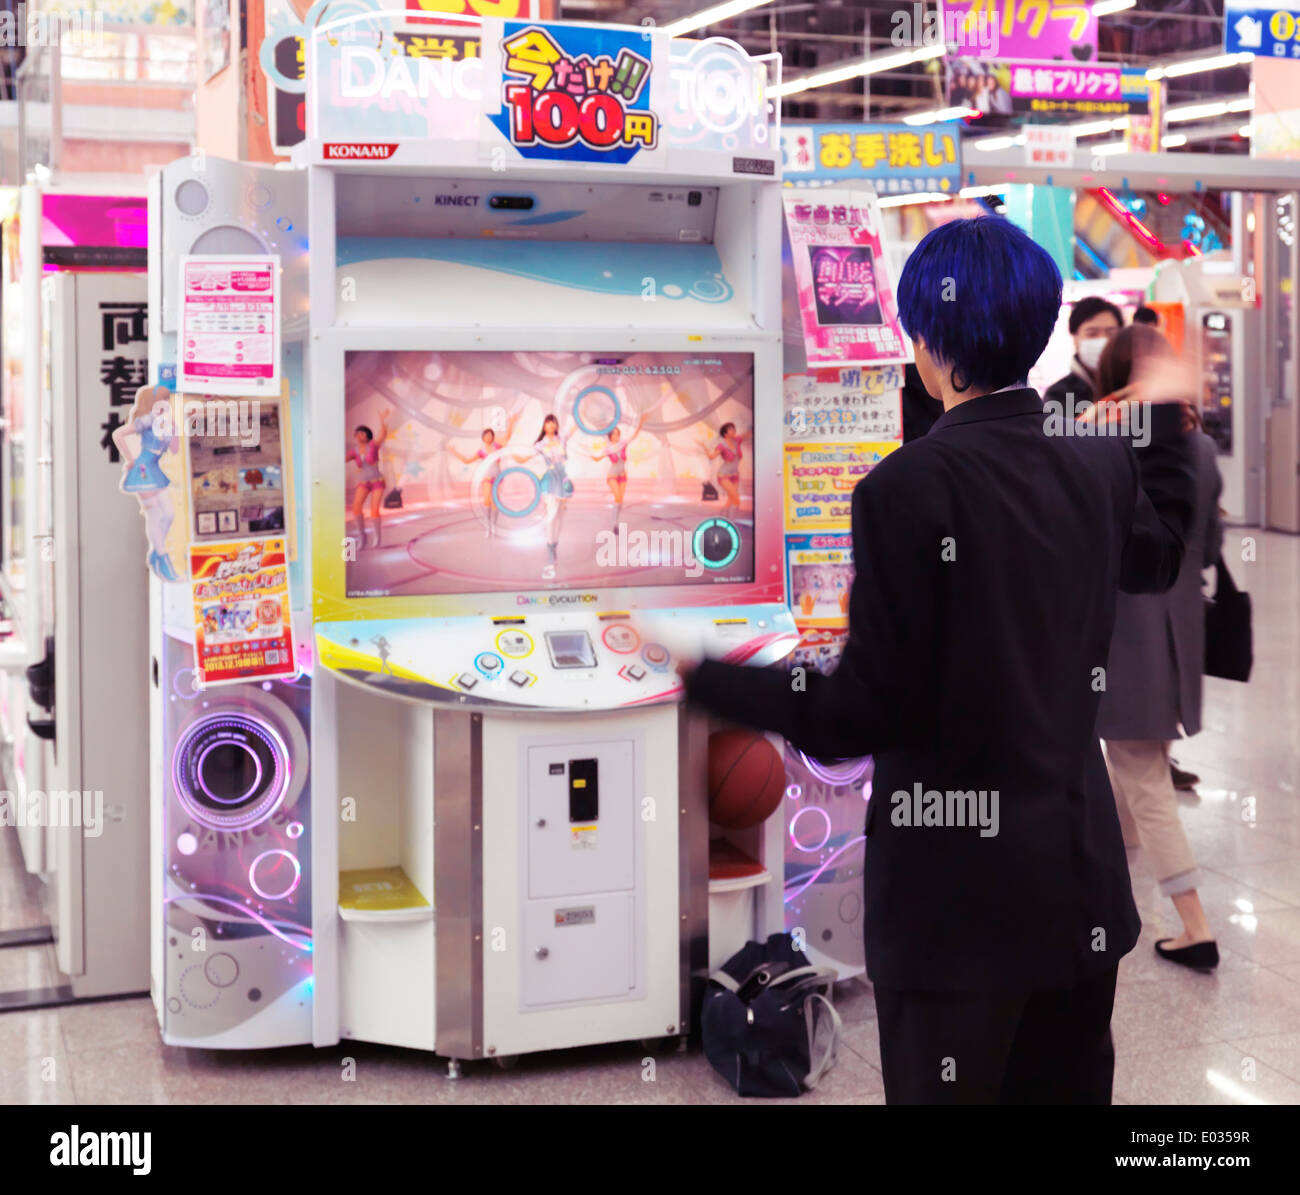 Girl playing dance station slot machine at arcade in Odaiba, Tokyo, Japan - Stock Image